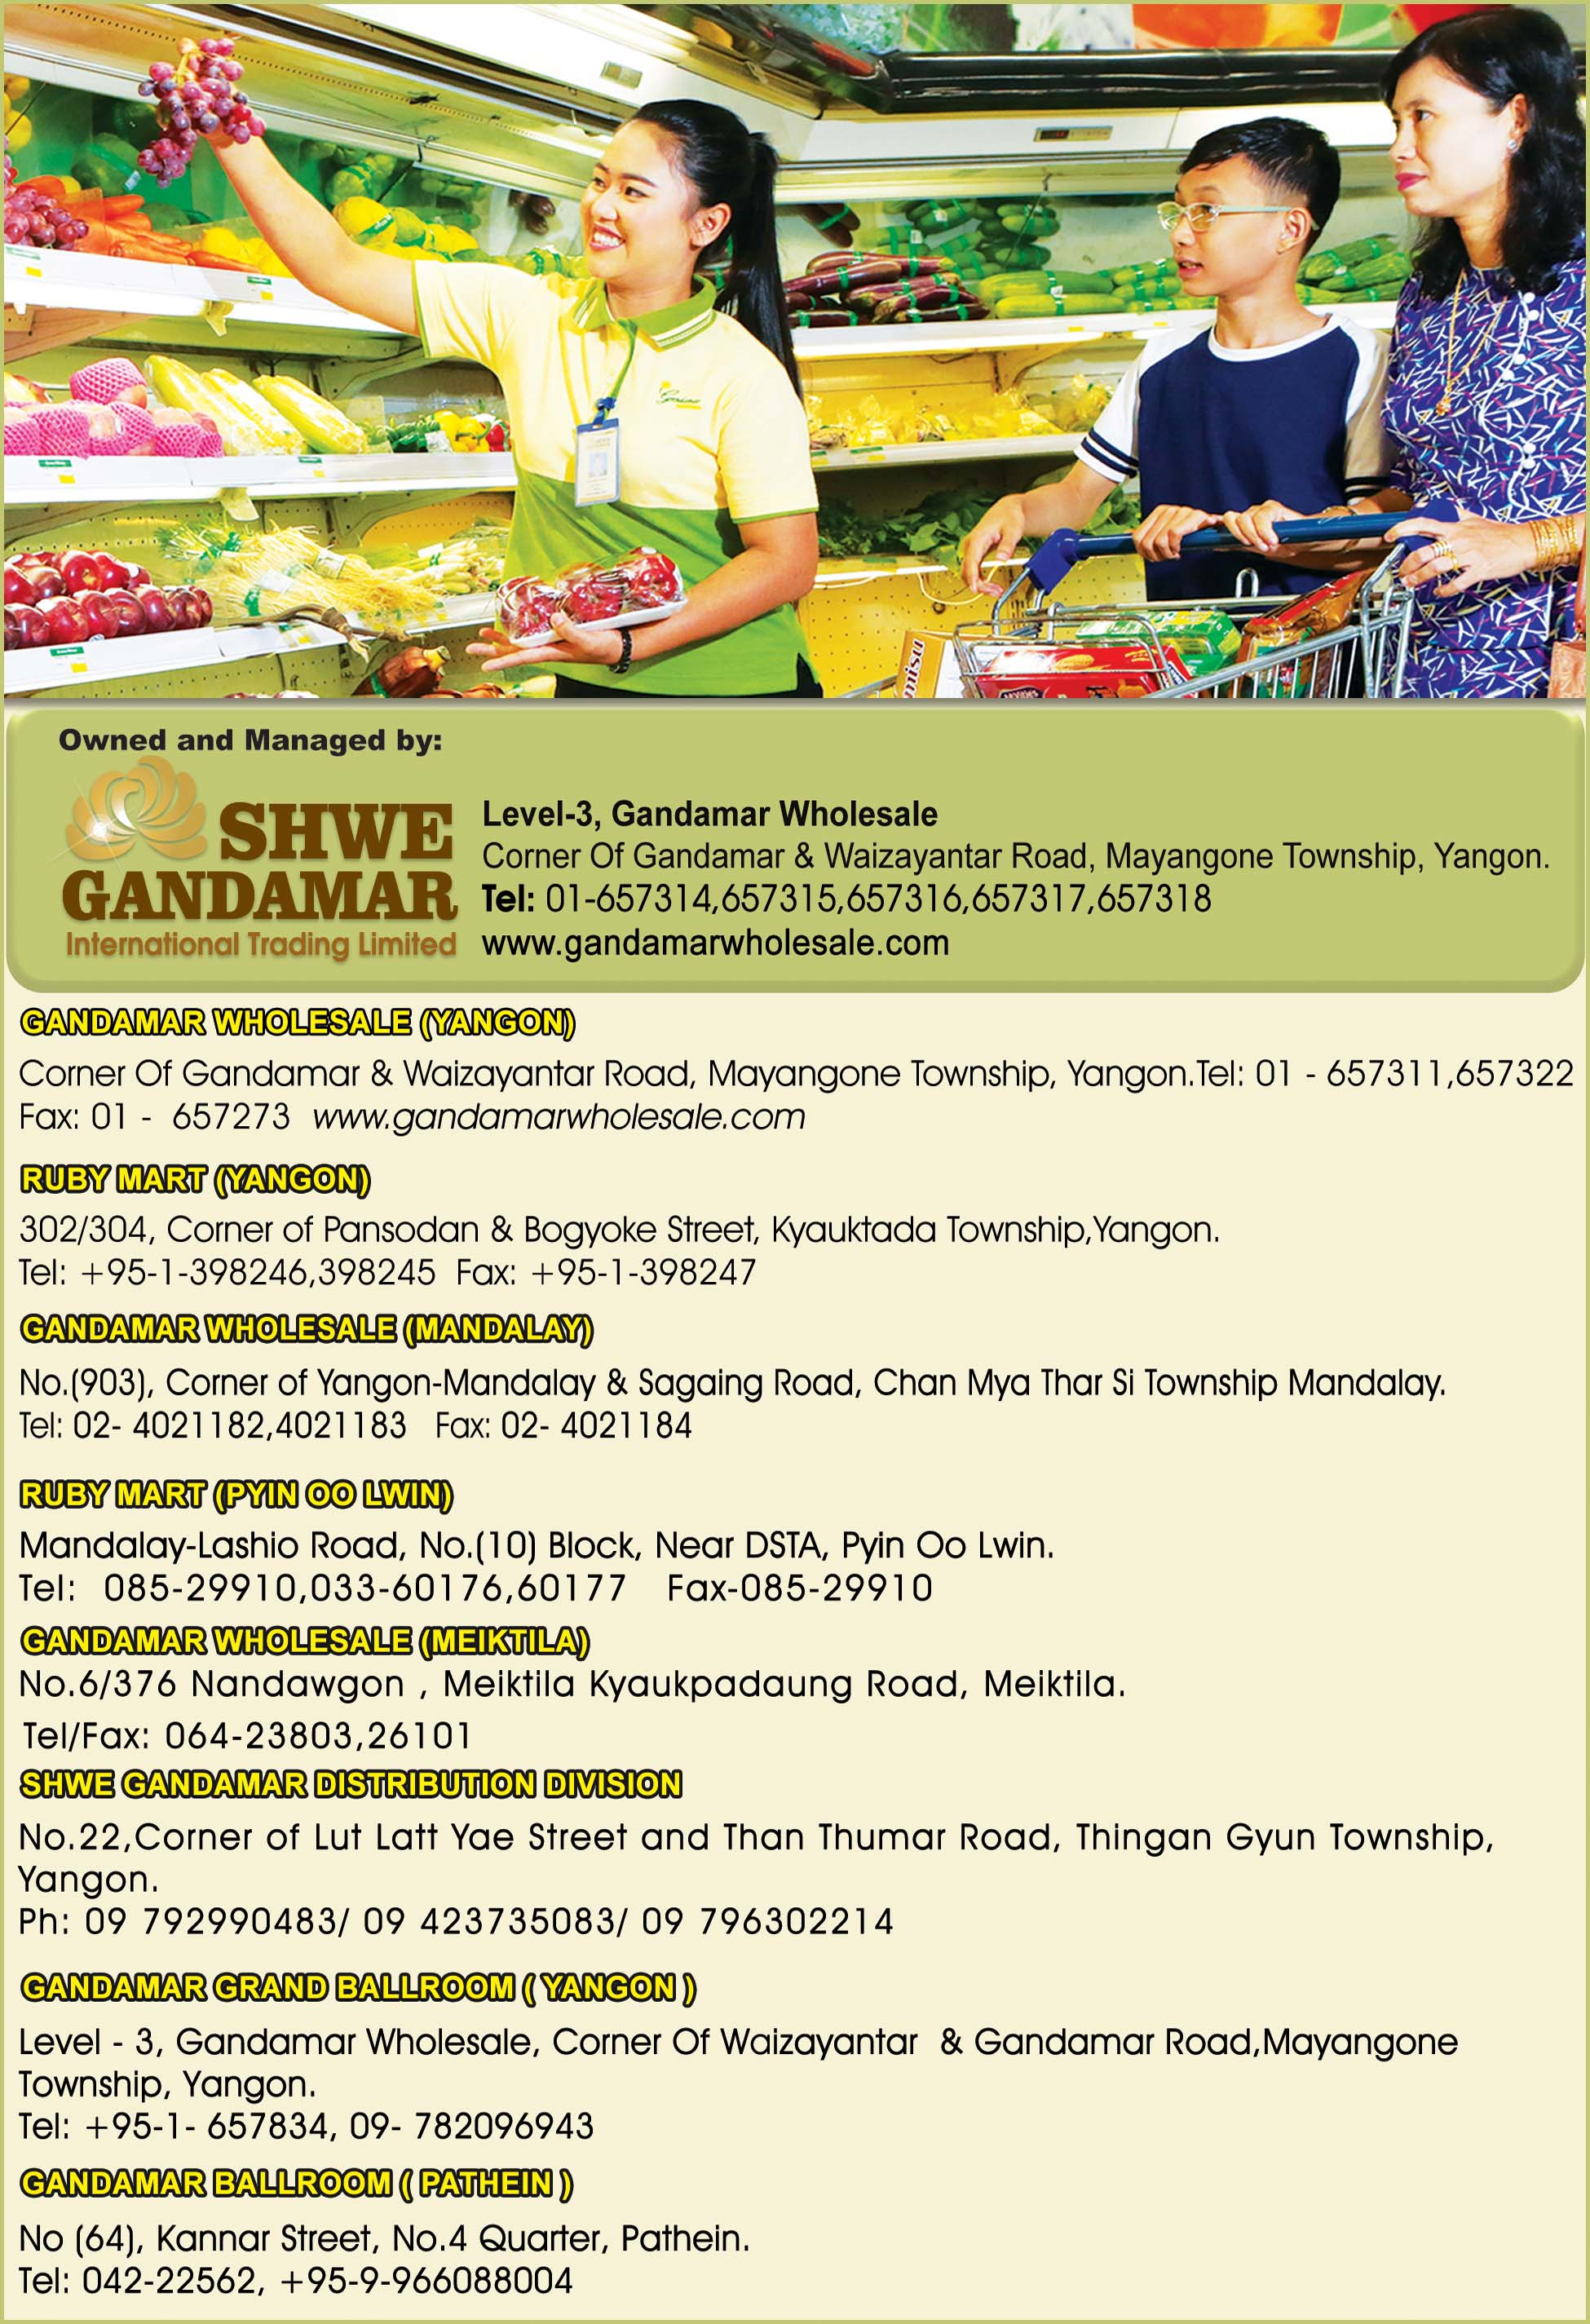 Shwe Gandamar International Trading Ltd.